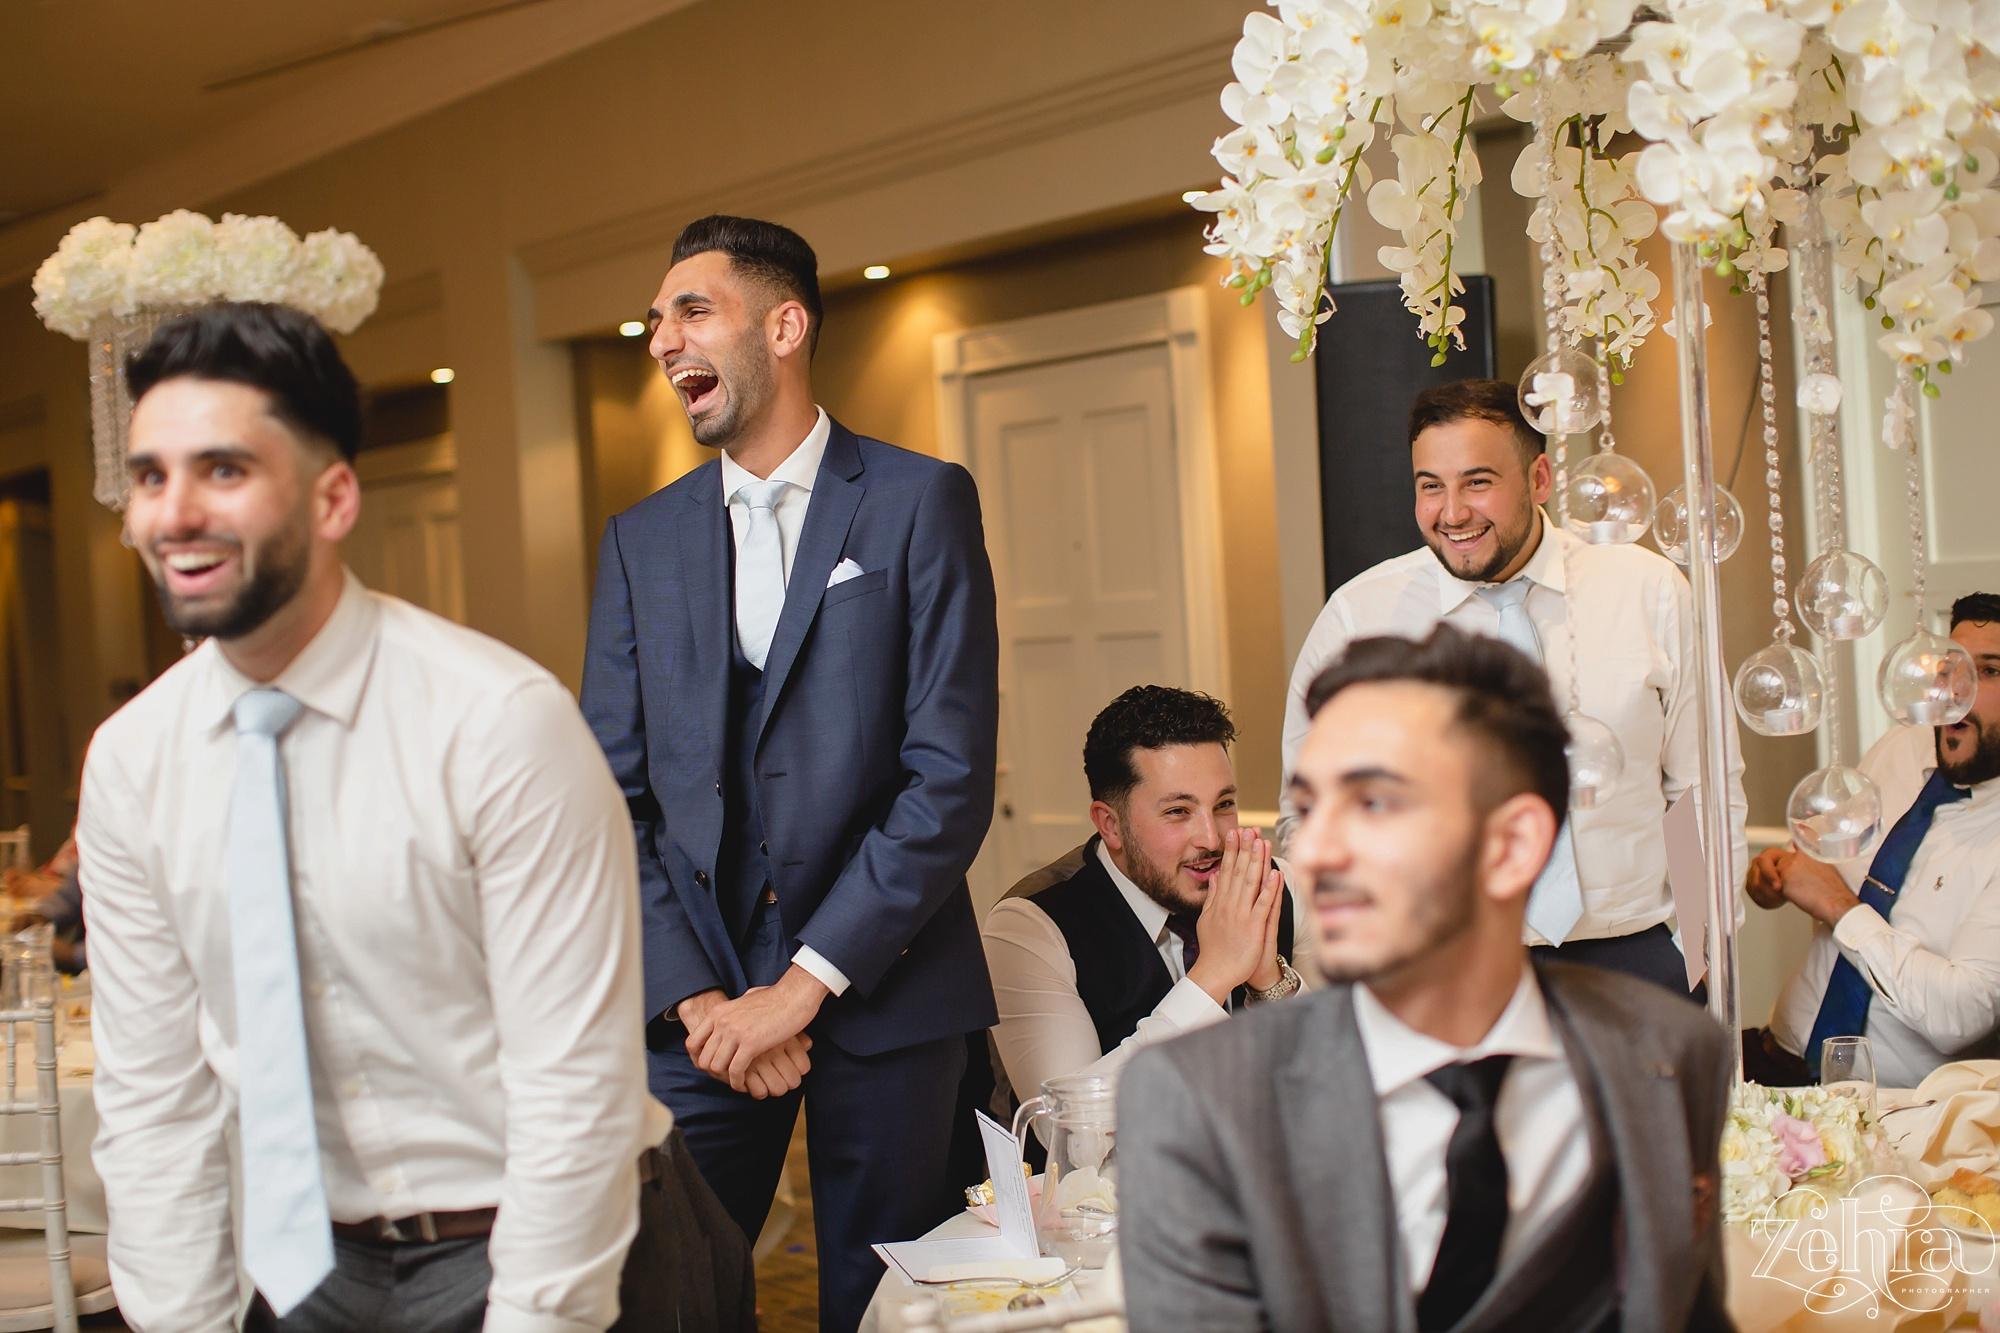 zehra photographer mere cheshire wedding_0057.jpg